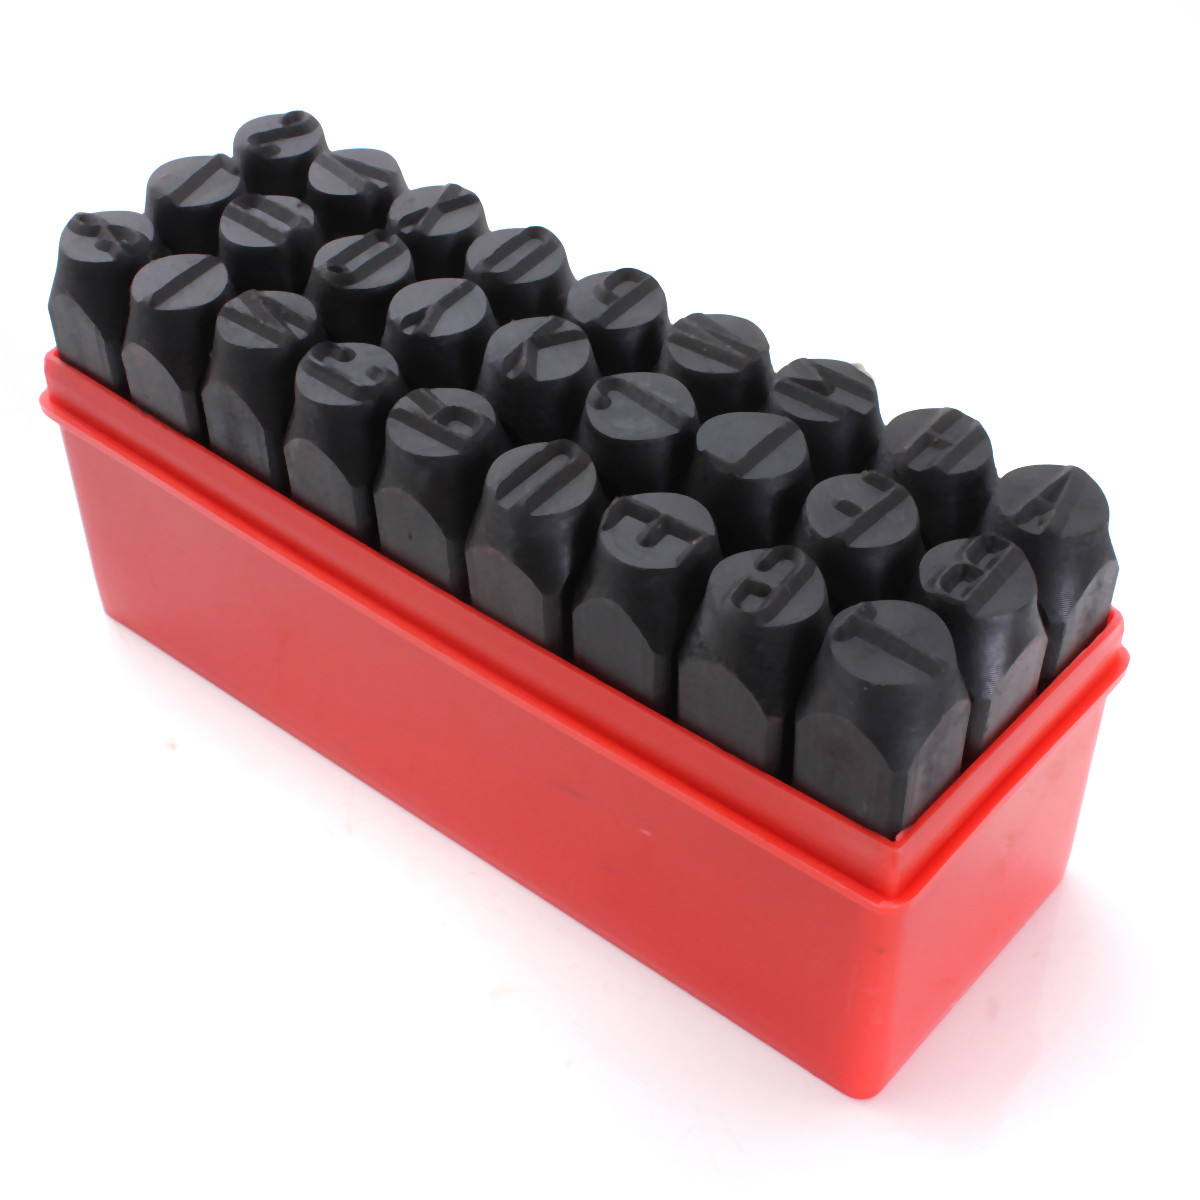 27pcs Selos Letras Do Alfabeto Conjunto Caixa De Ferramentas de Metal de Aço Soco Craft Hot 2/2. 5/3/4/5/6/8/10/12.5mm